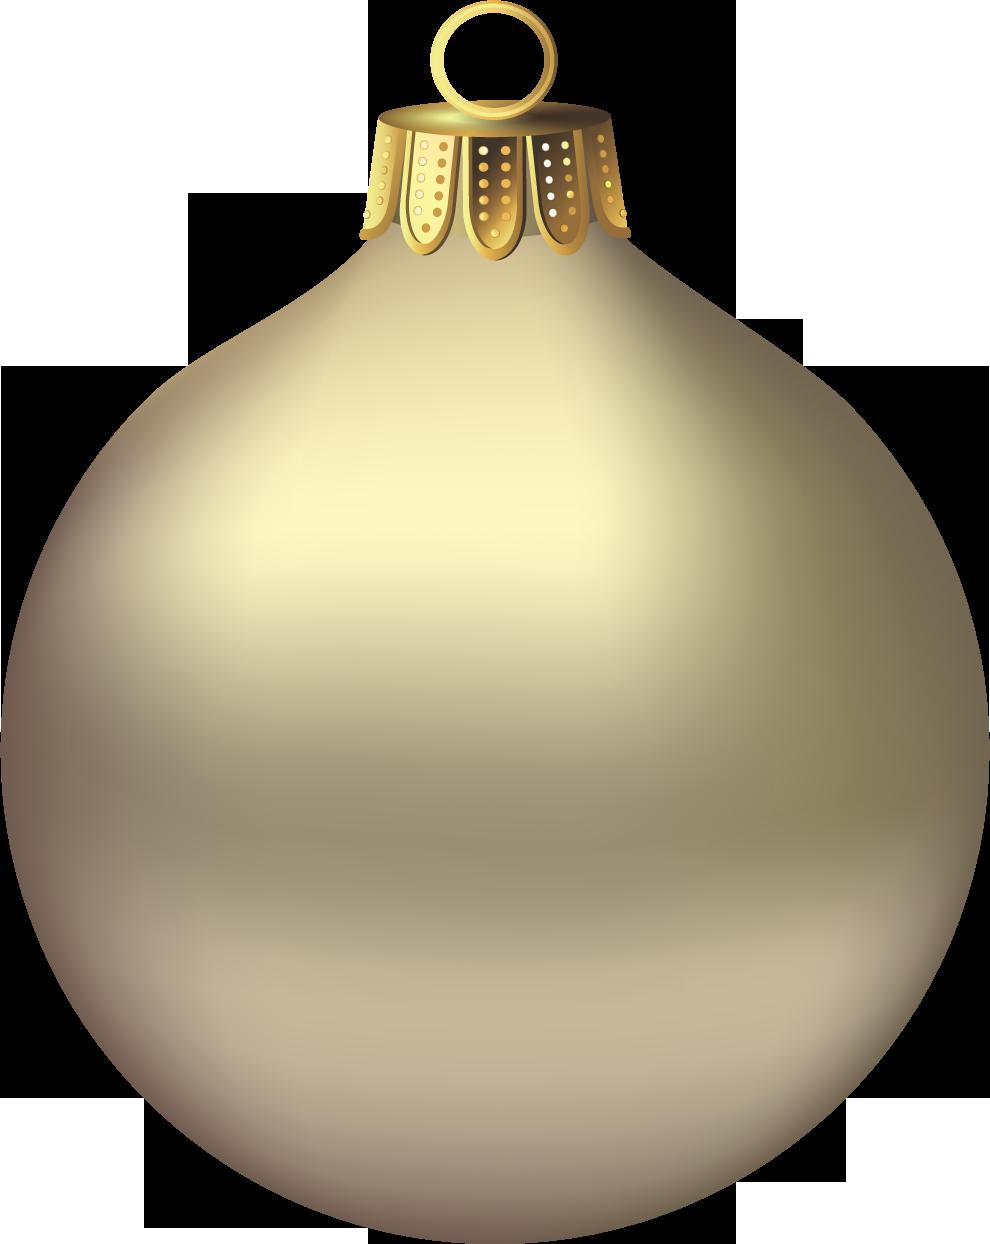 Poinsettia clipart ornament. Https www google ca